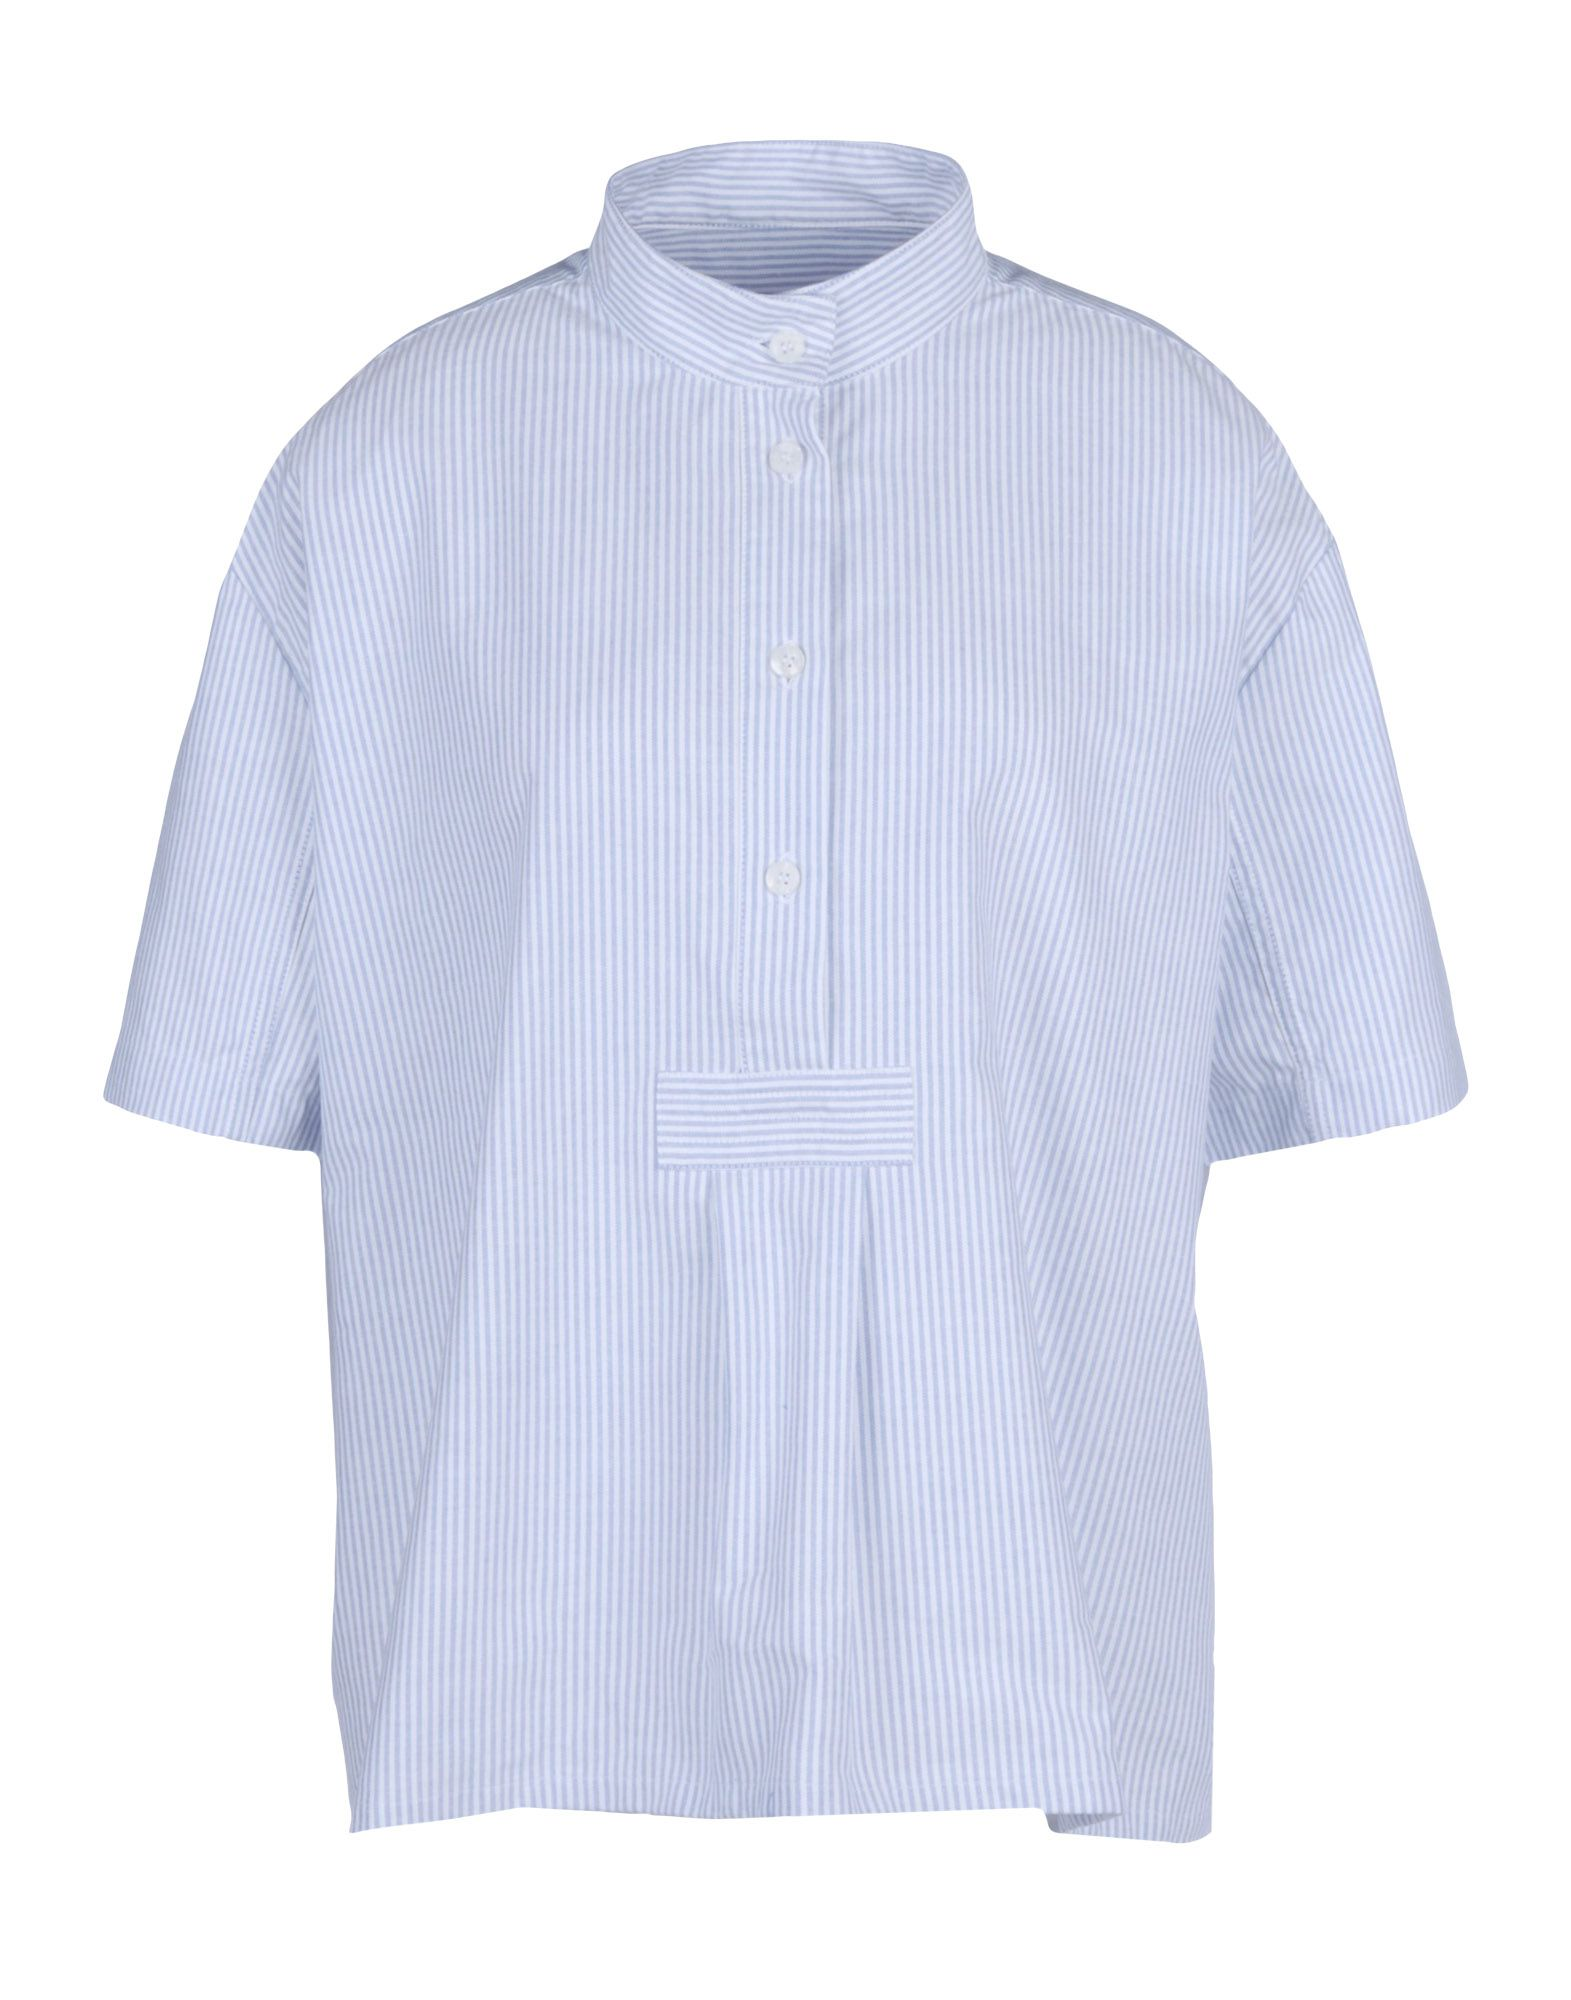 THE SLEEP SHIRT Пижама europe and the united states large size female sleeveless chiffon vest candy color wild chiffon shirt sling shirt l01